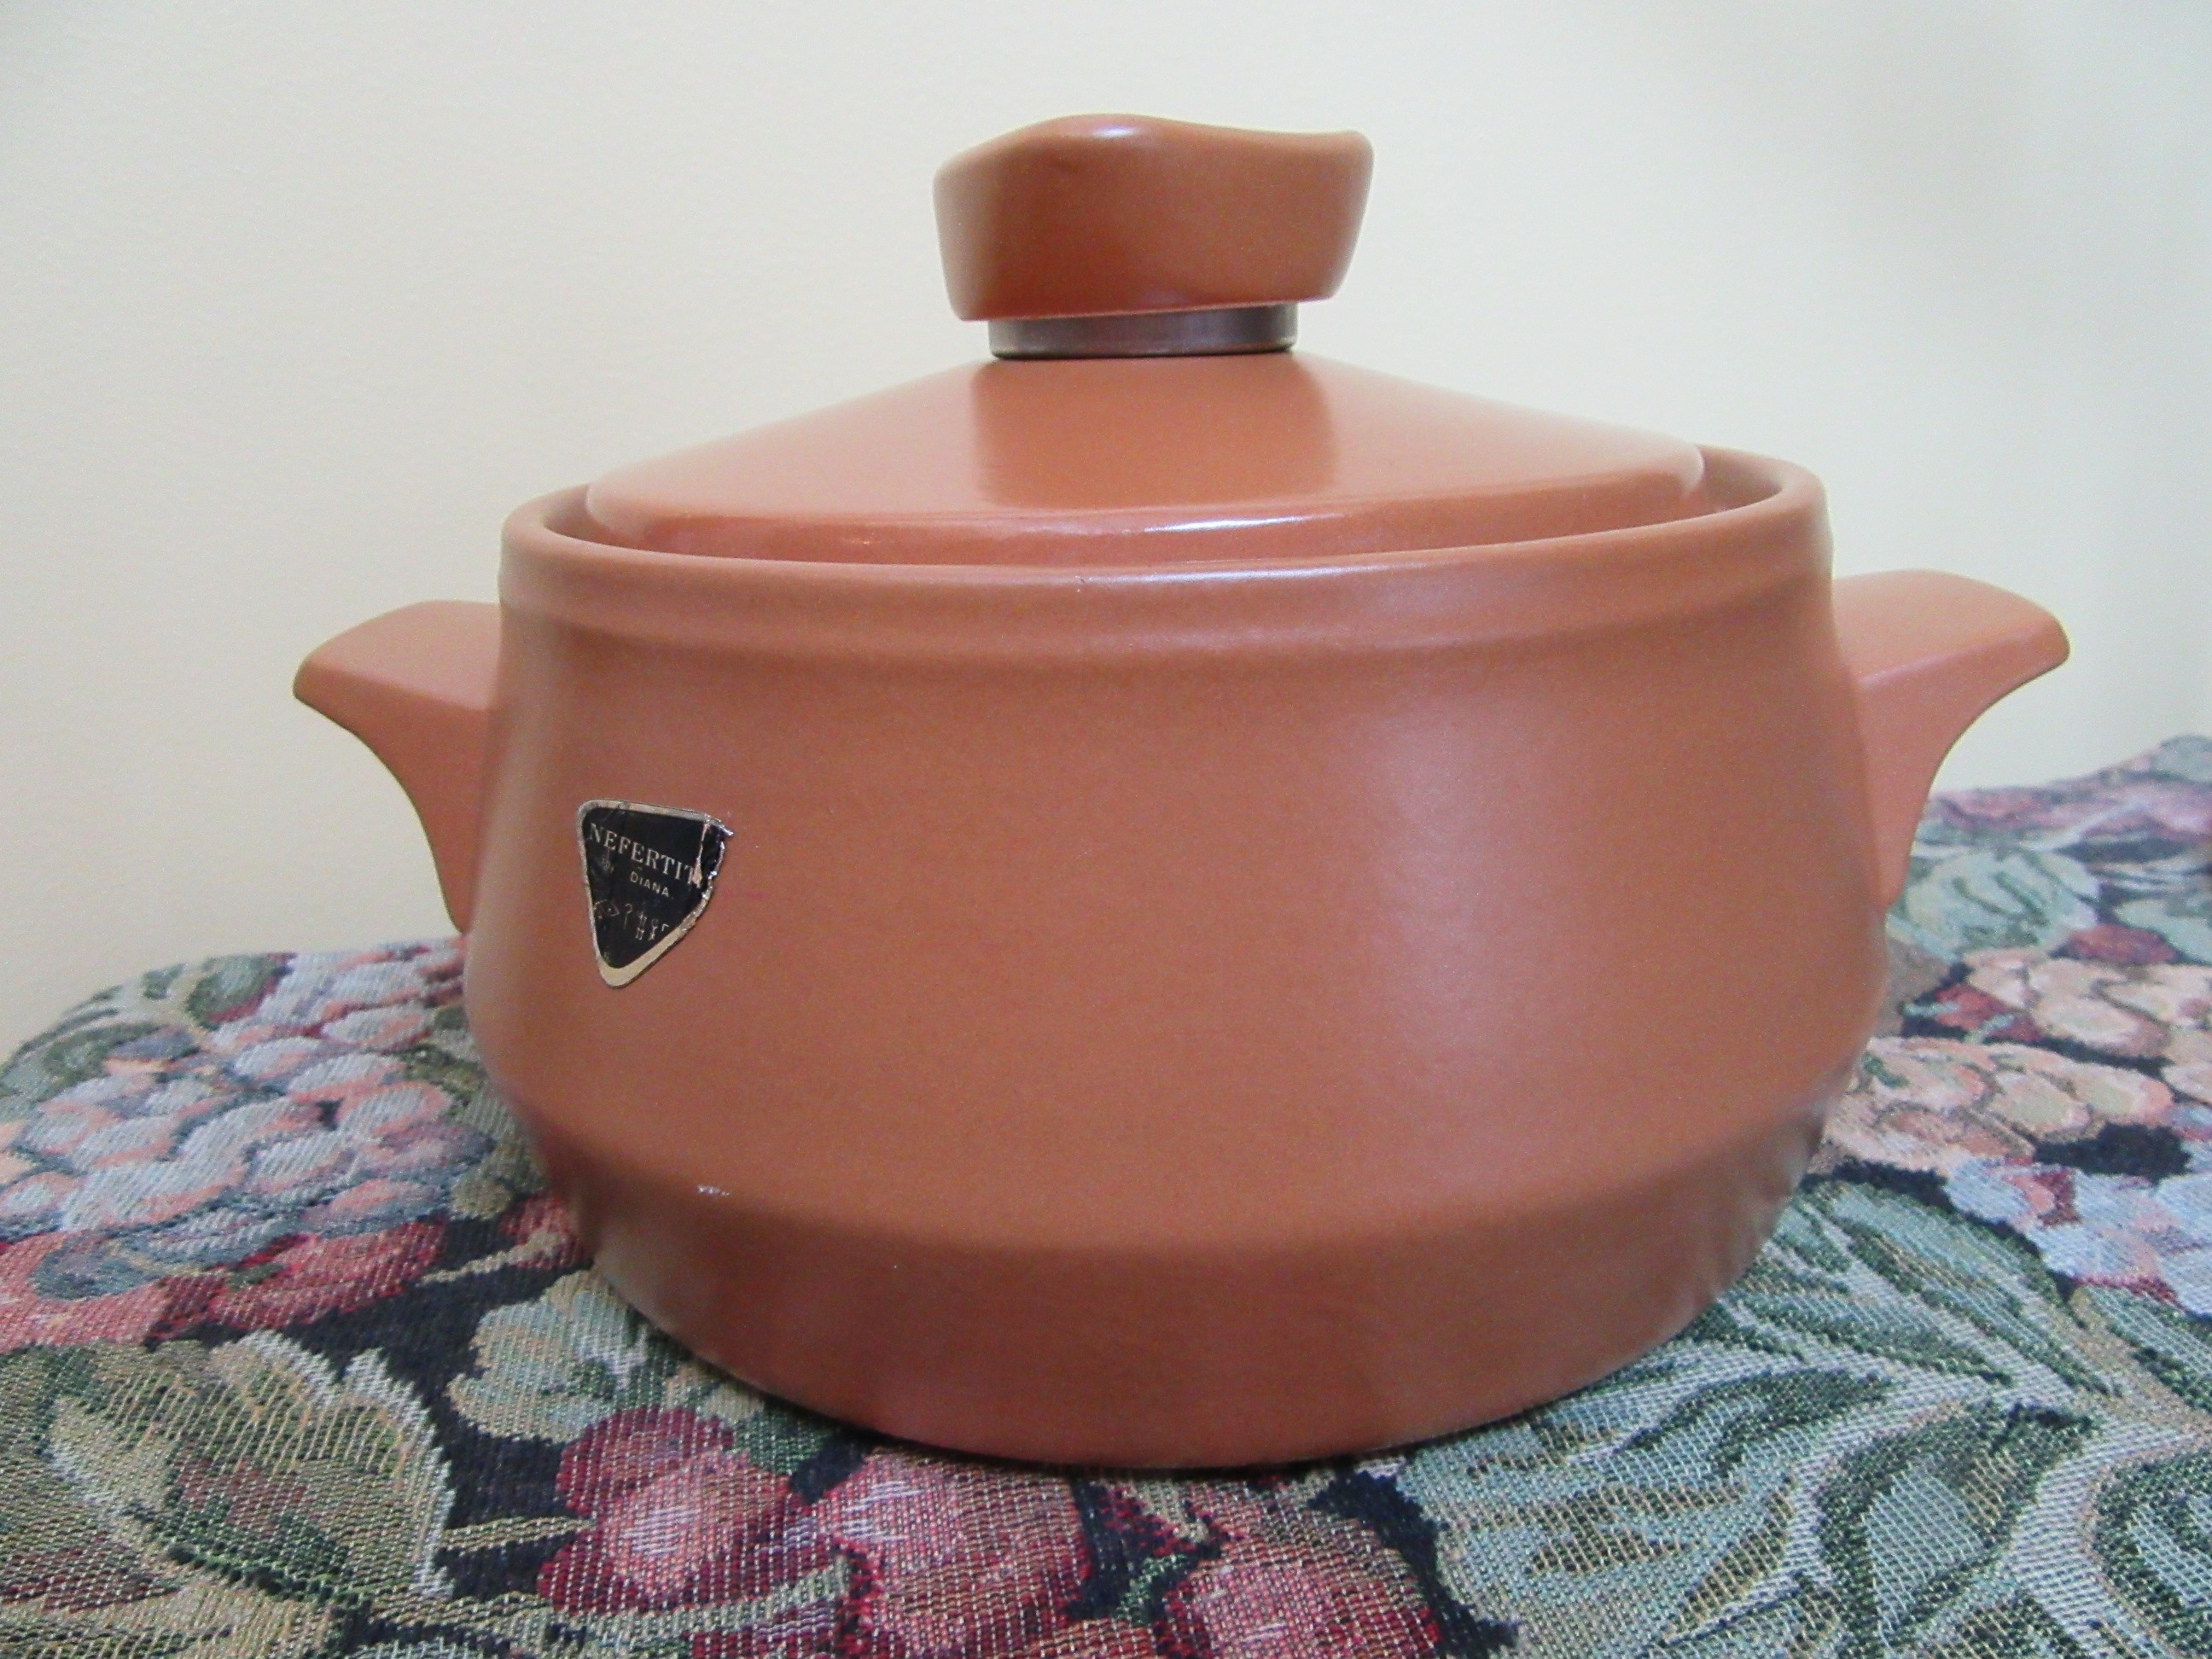 Diana nefertiti casserole dish medium lidded 1960s for Diana dishes